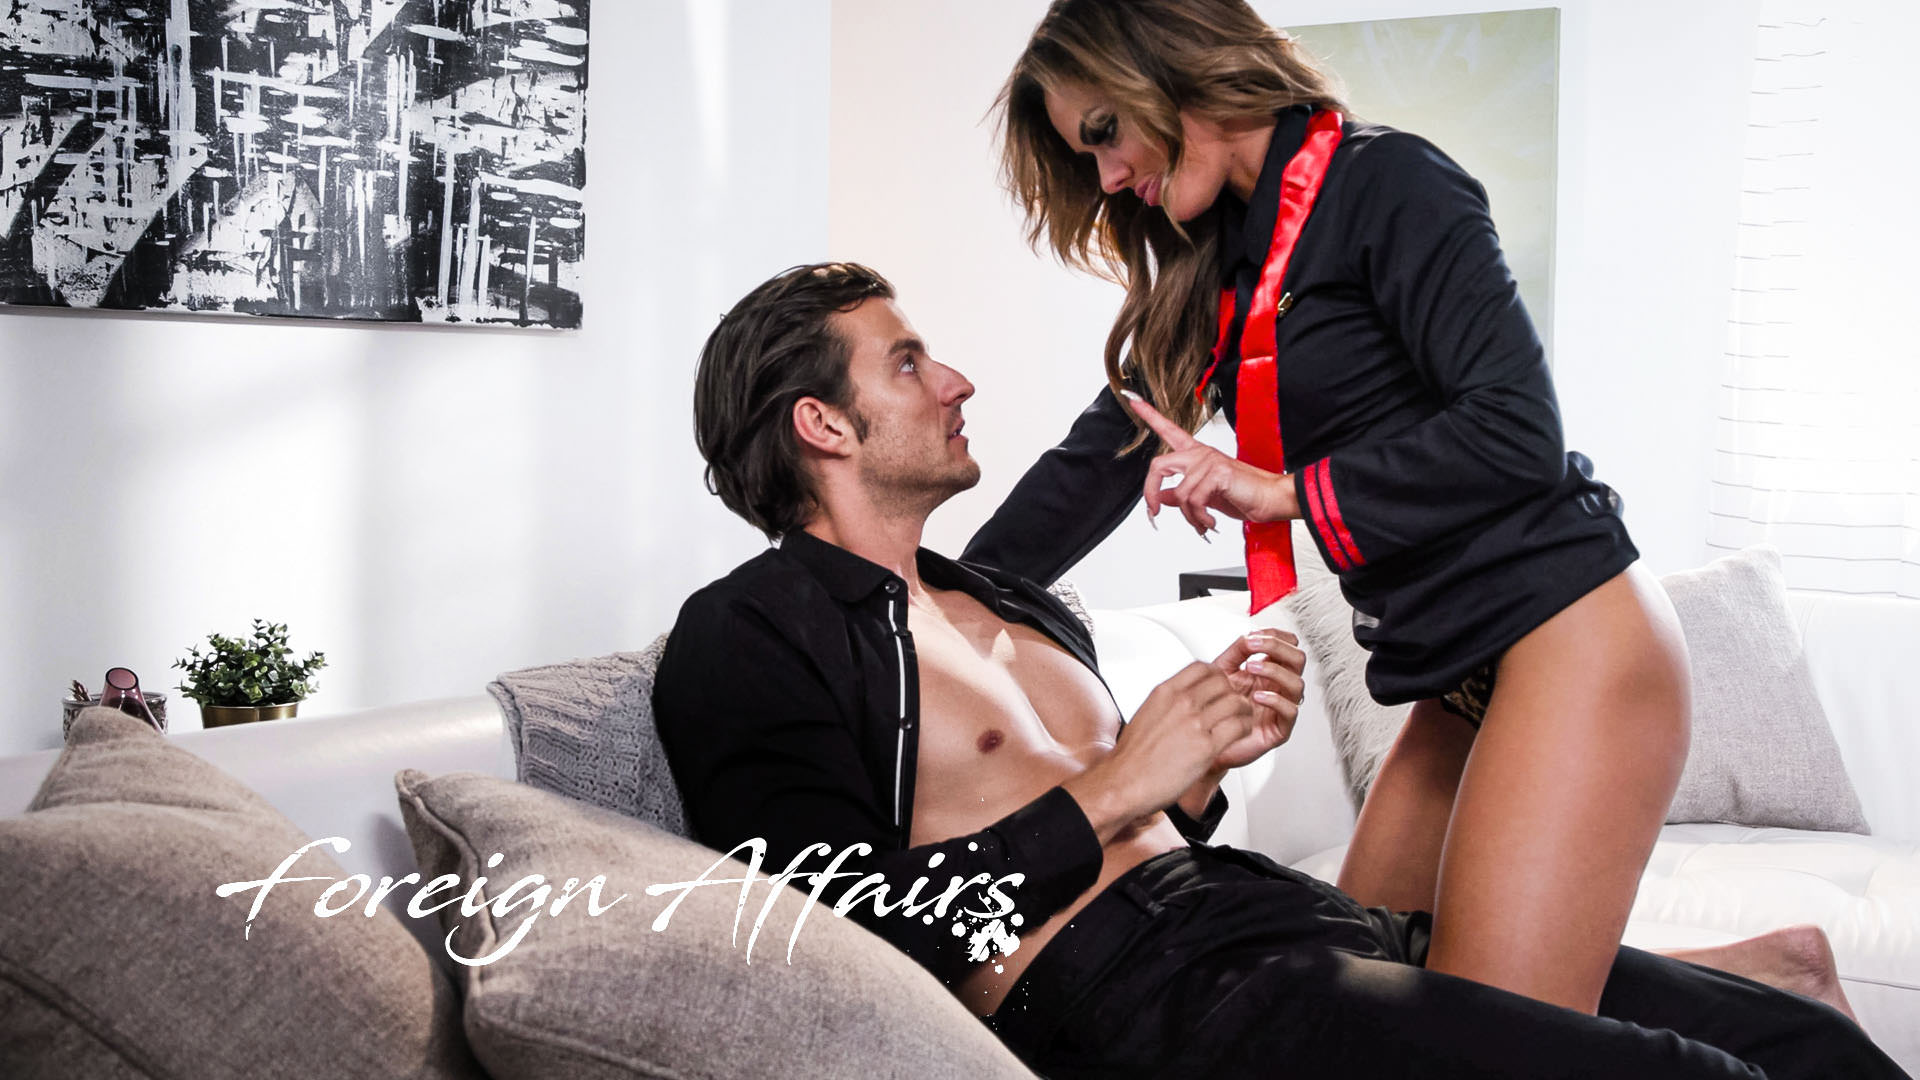 Foreign Affairs, Scene #01